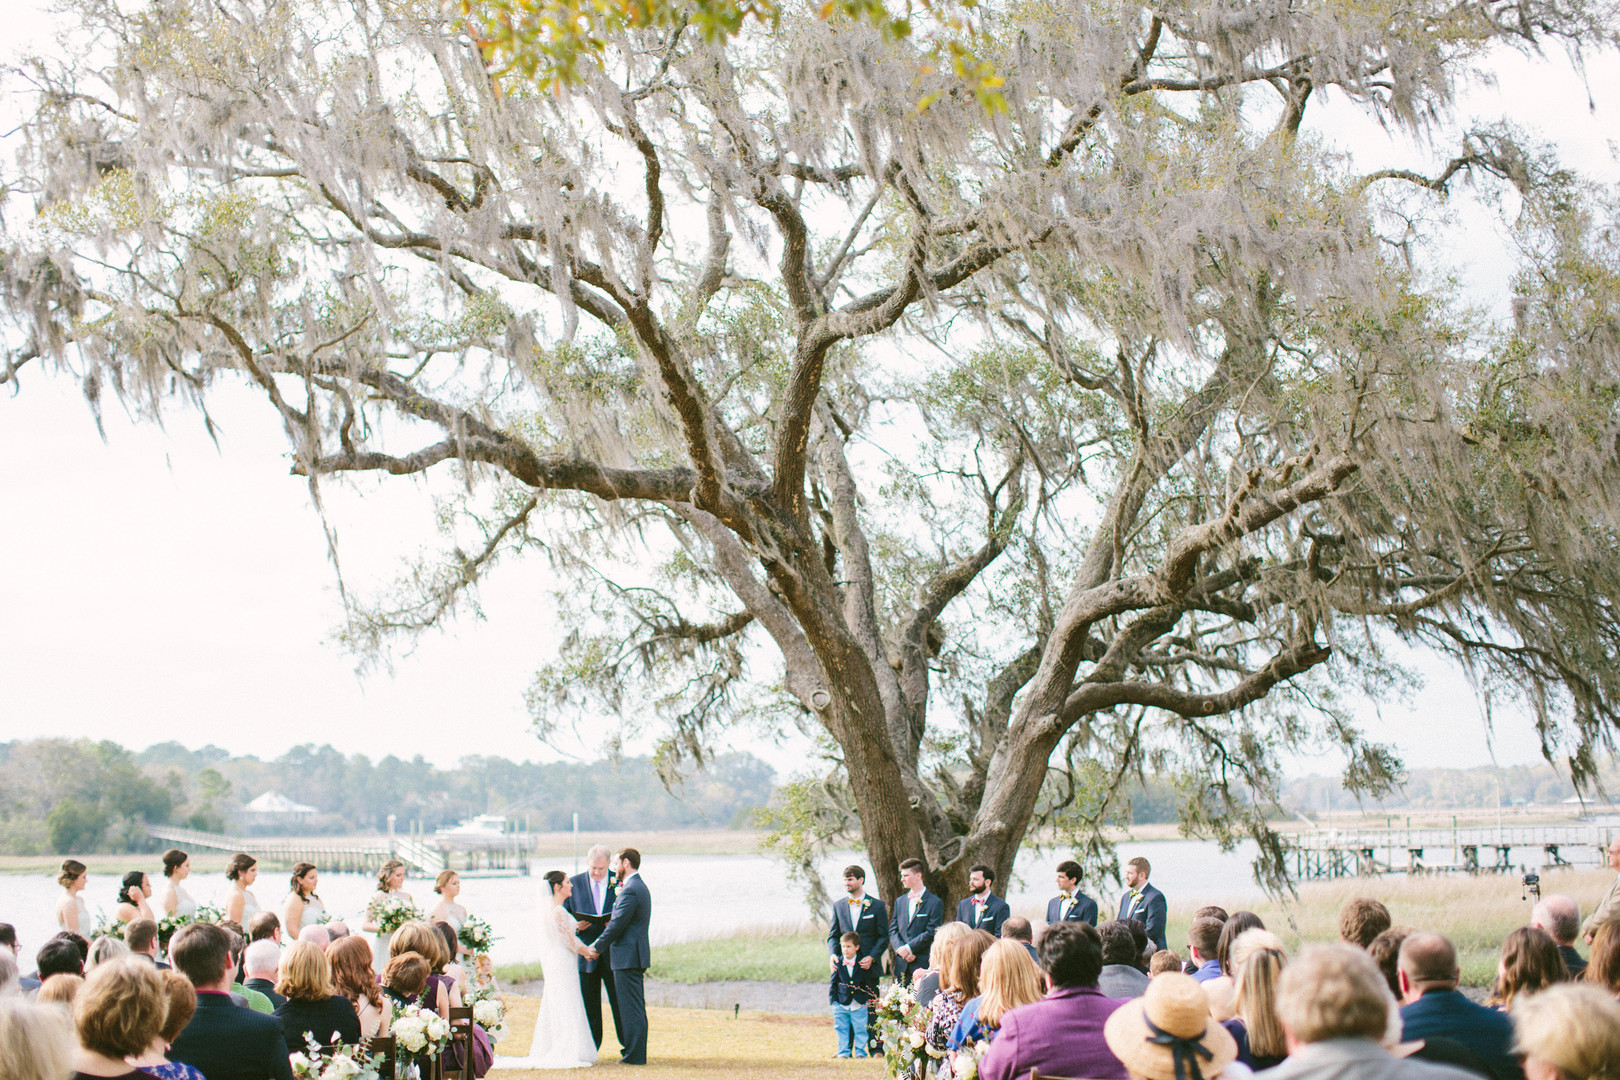 oak-point-plantation-wedding-21.jpg